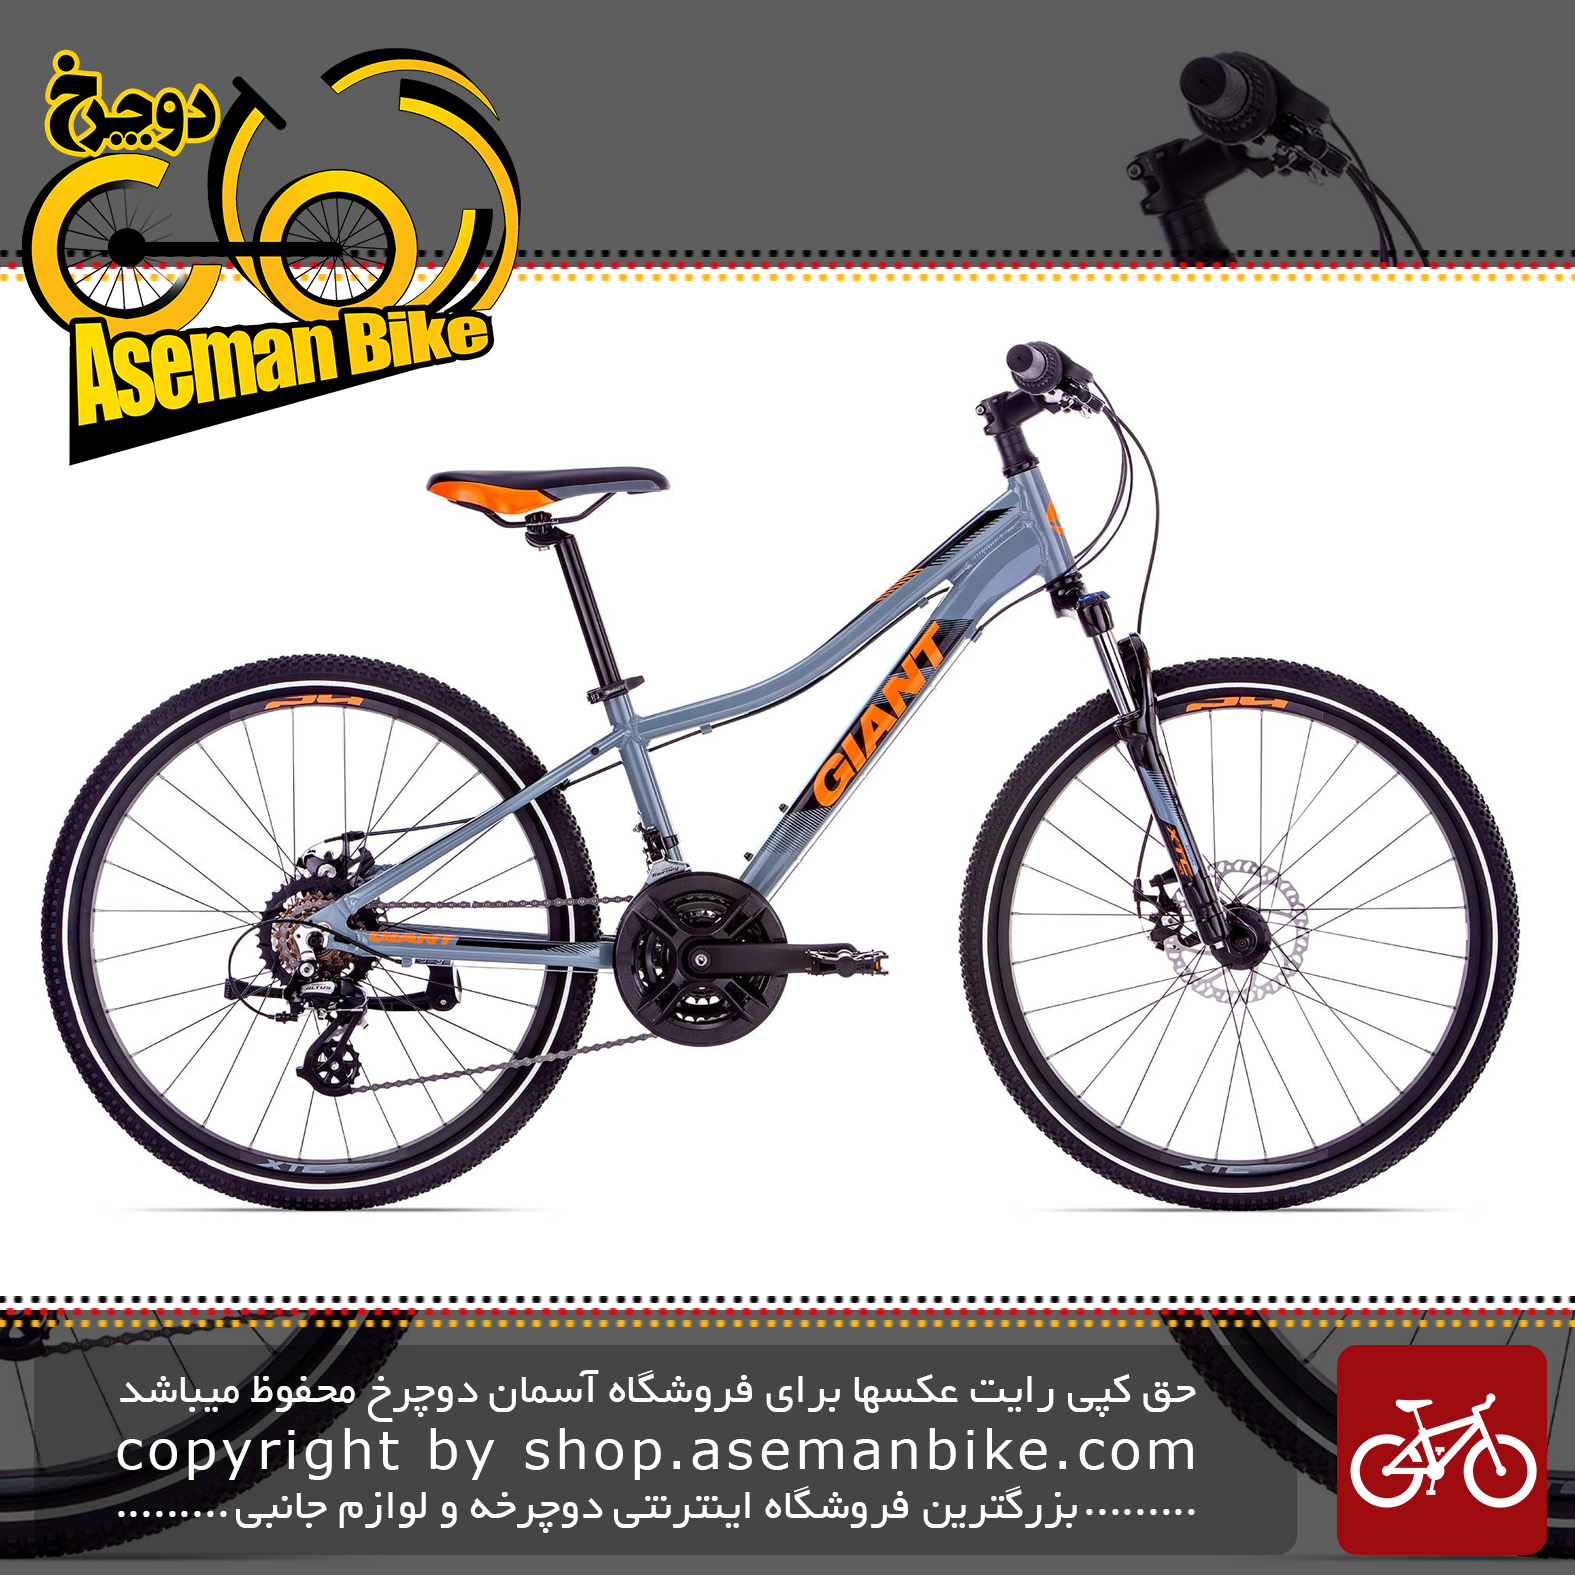 دوچرخه کوهستان جاینت مدل ایکس تی سی اس ال جی آر دیسک هیدرولیک 24 اینچ 2020 Giant Mountain Bicycle XtC Jr Disc 24 2020